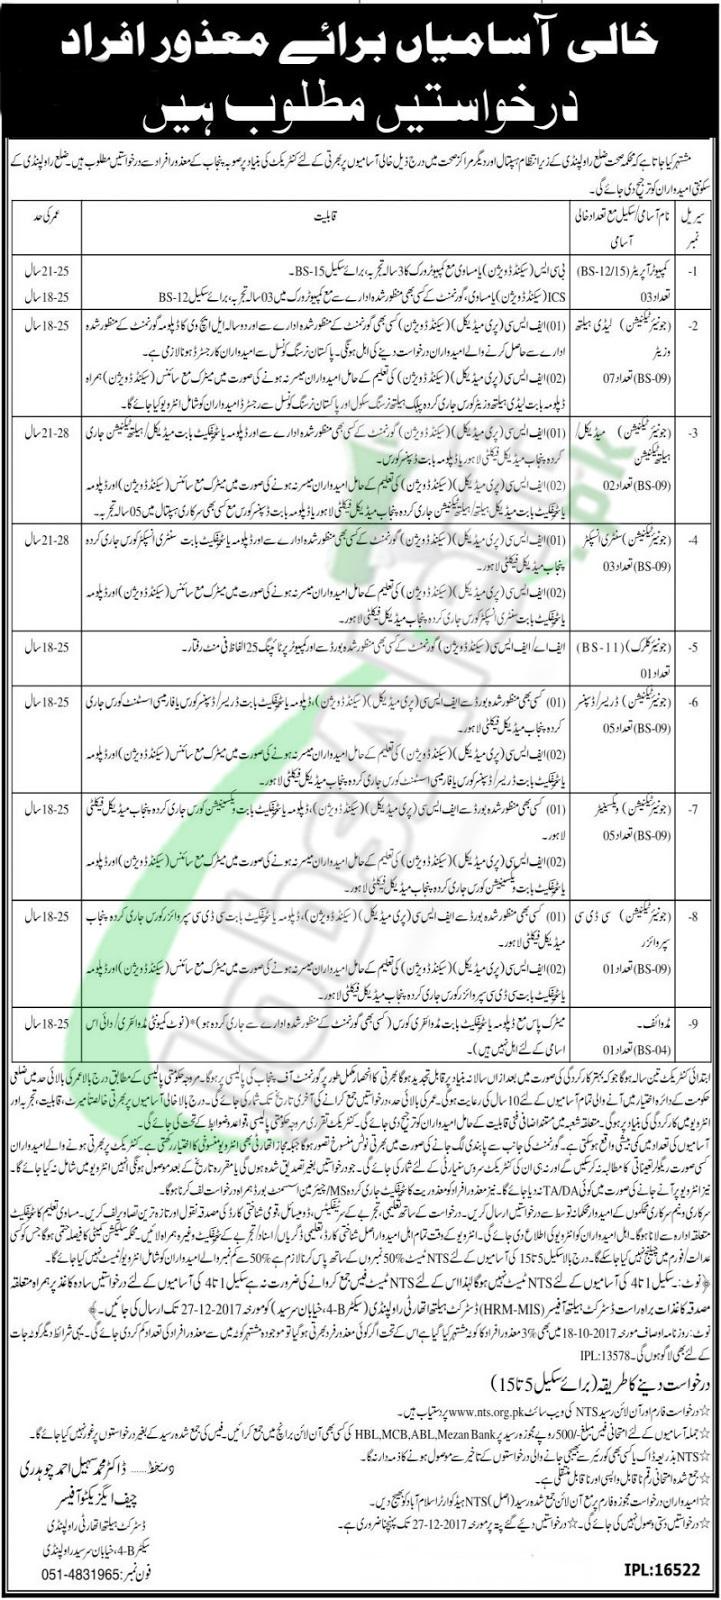 Government Jobs in Rawalpindi